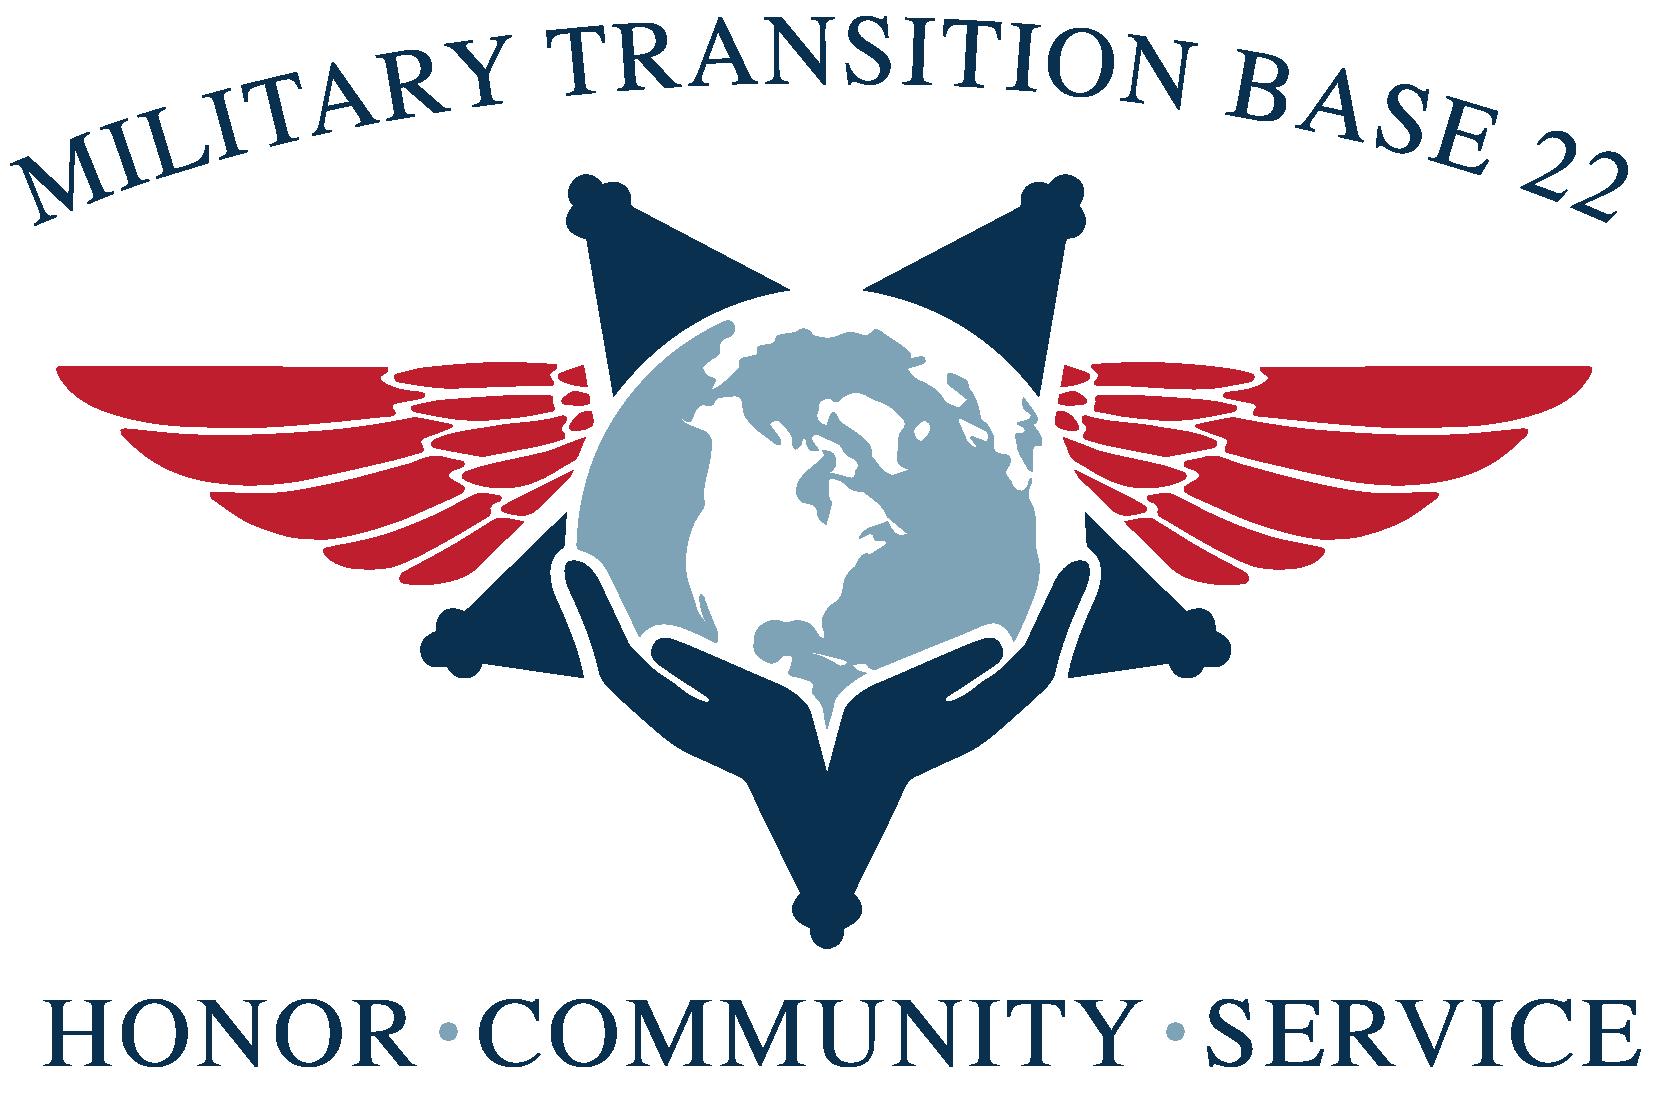 dajon ferrell military transitional base 22